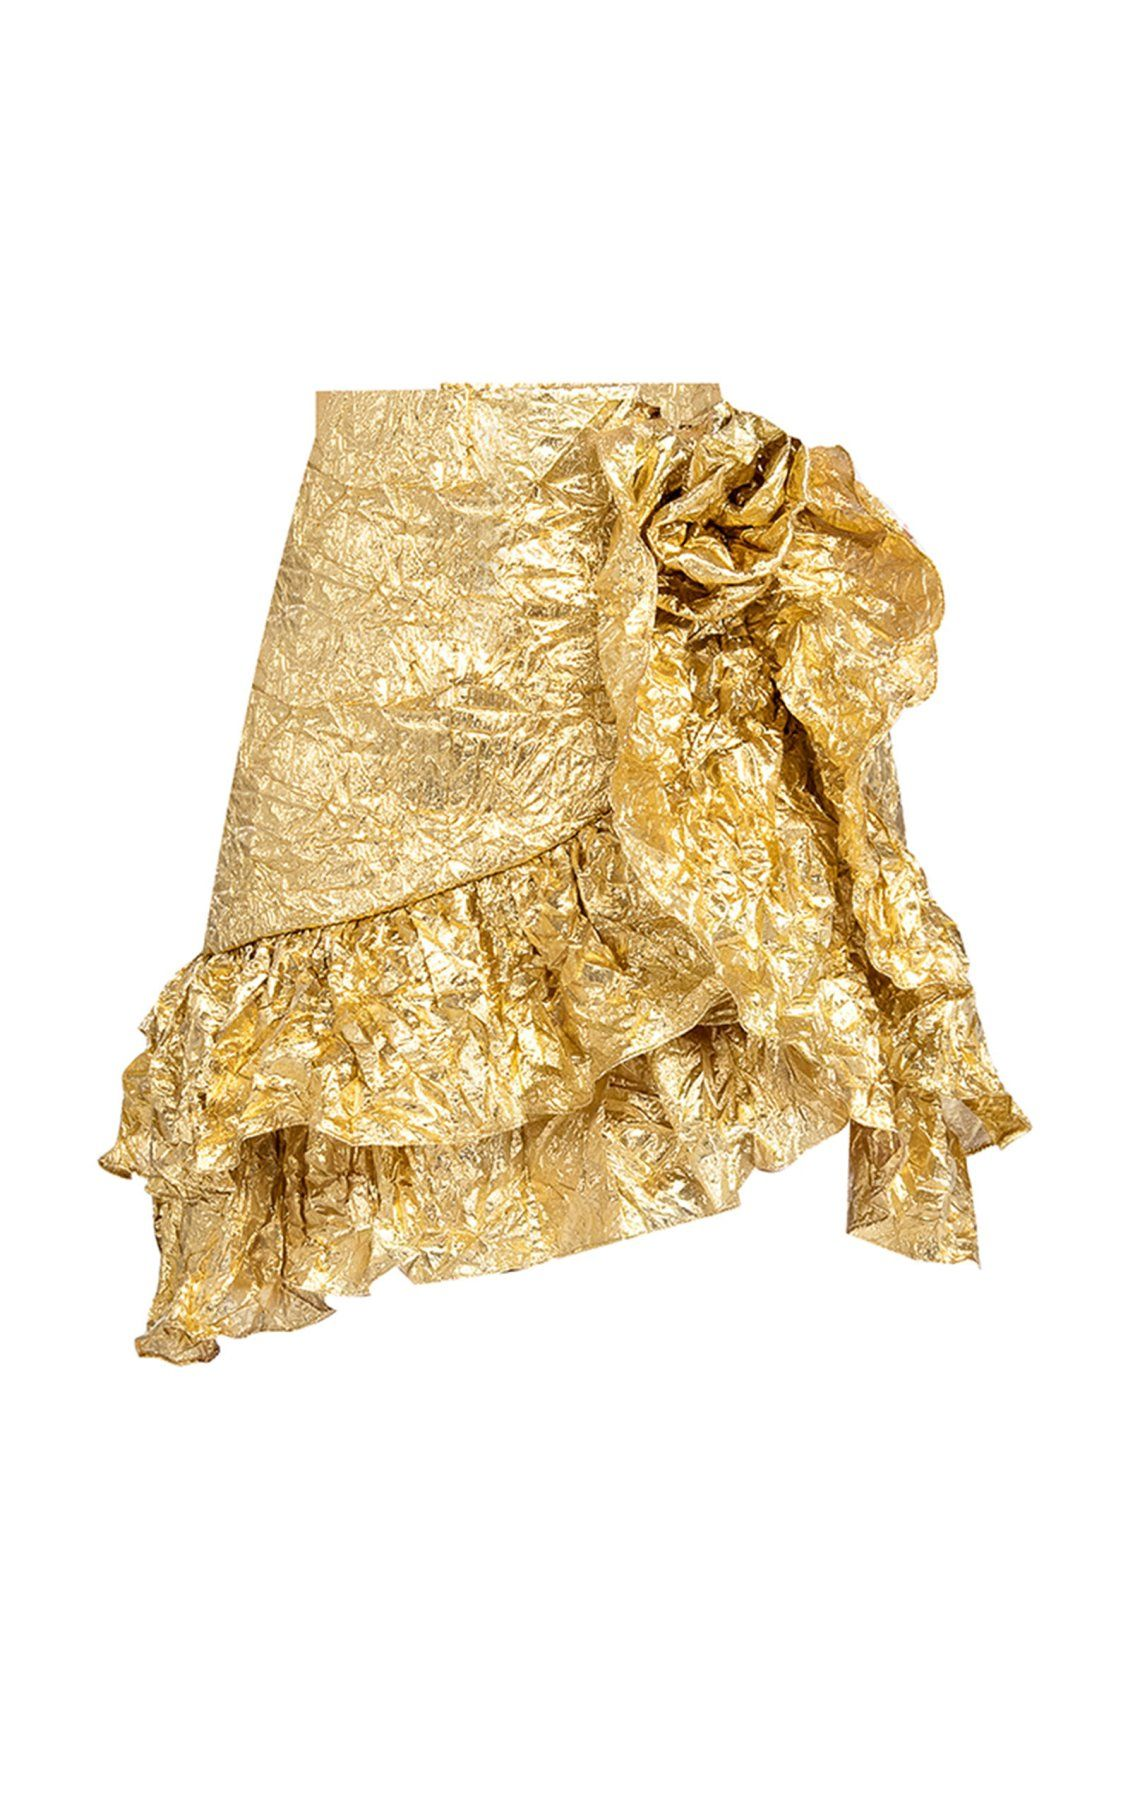 78da059d2efb Gold Wrinkle Ruffle Skirt by Bambah SS19   Spring/Summer Must Haves ...